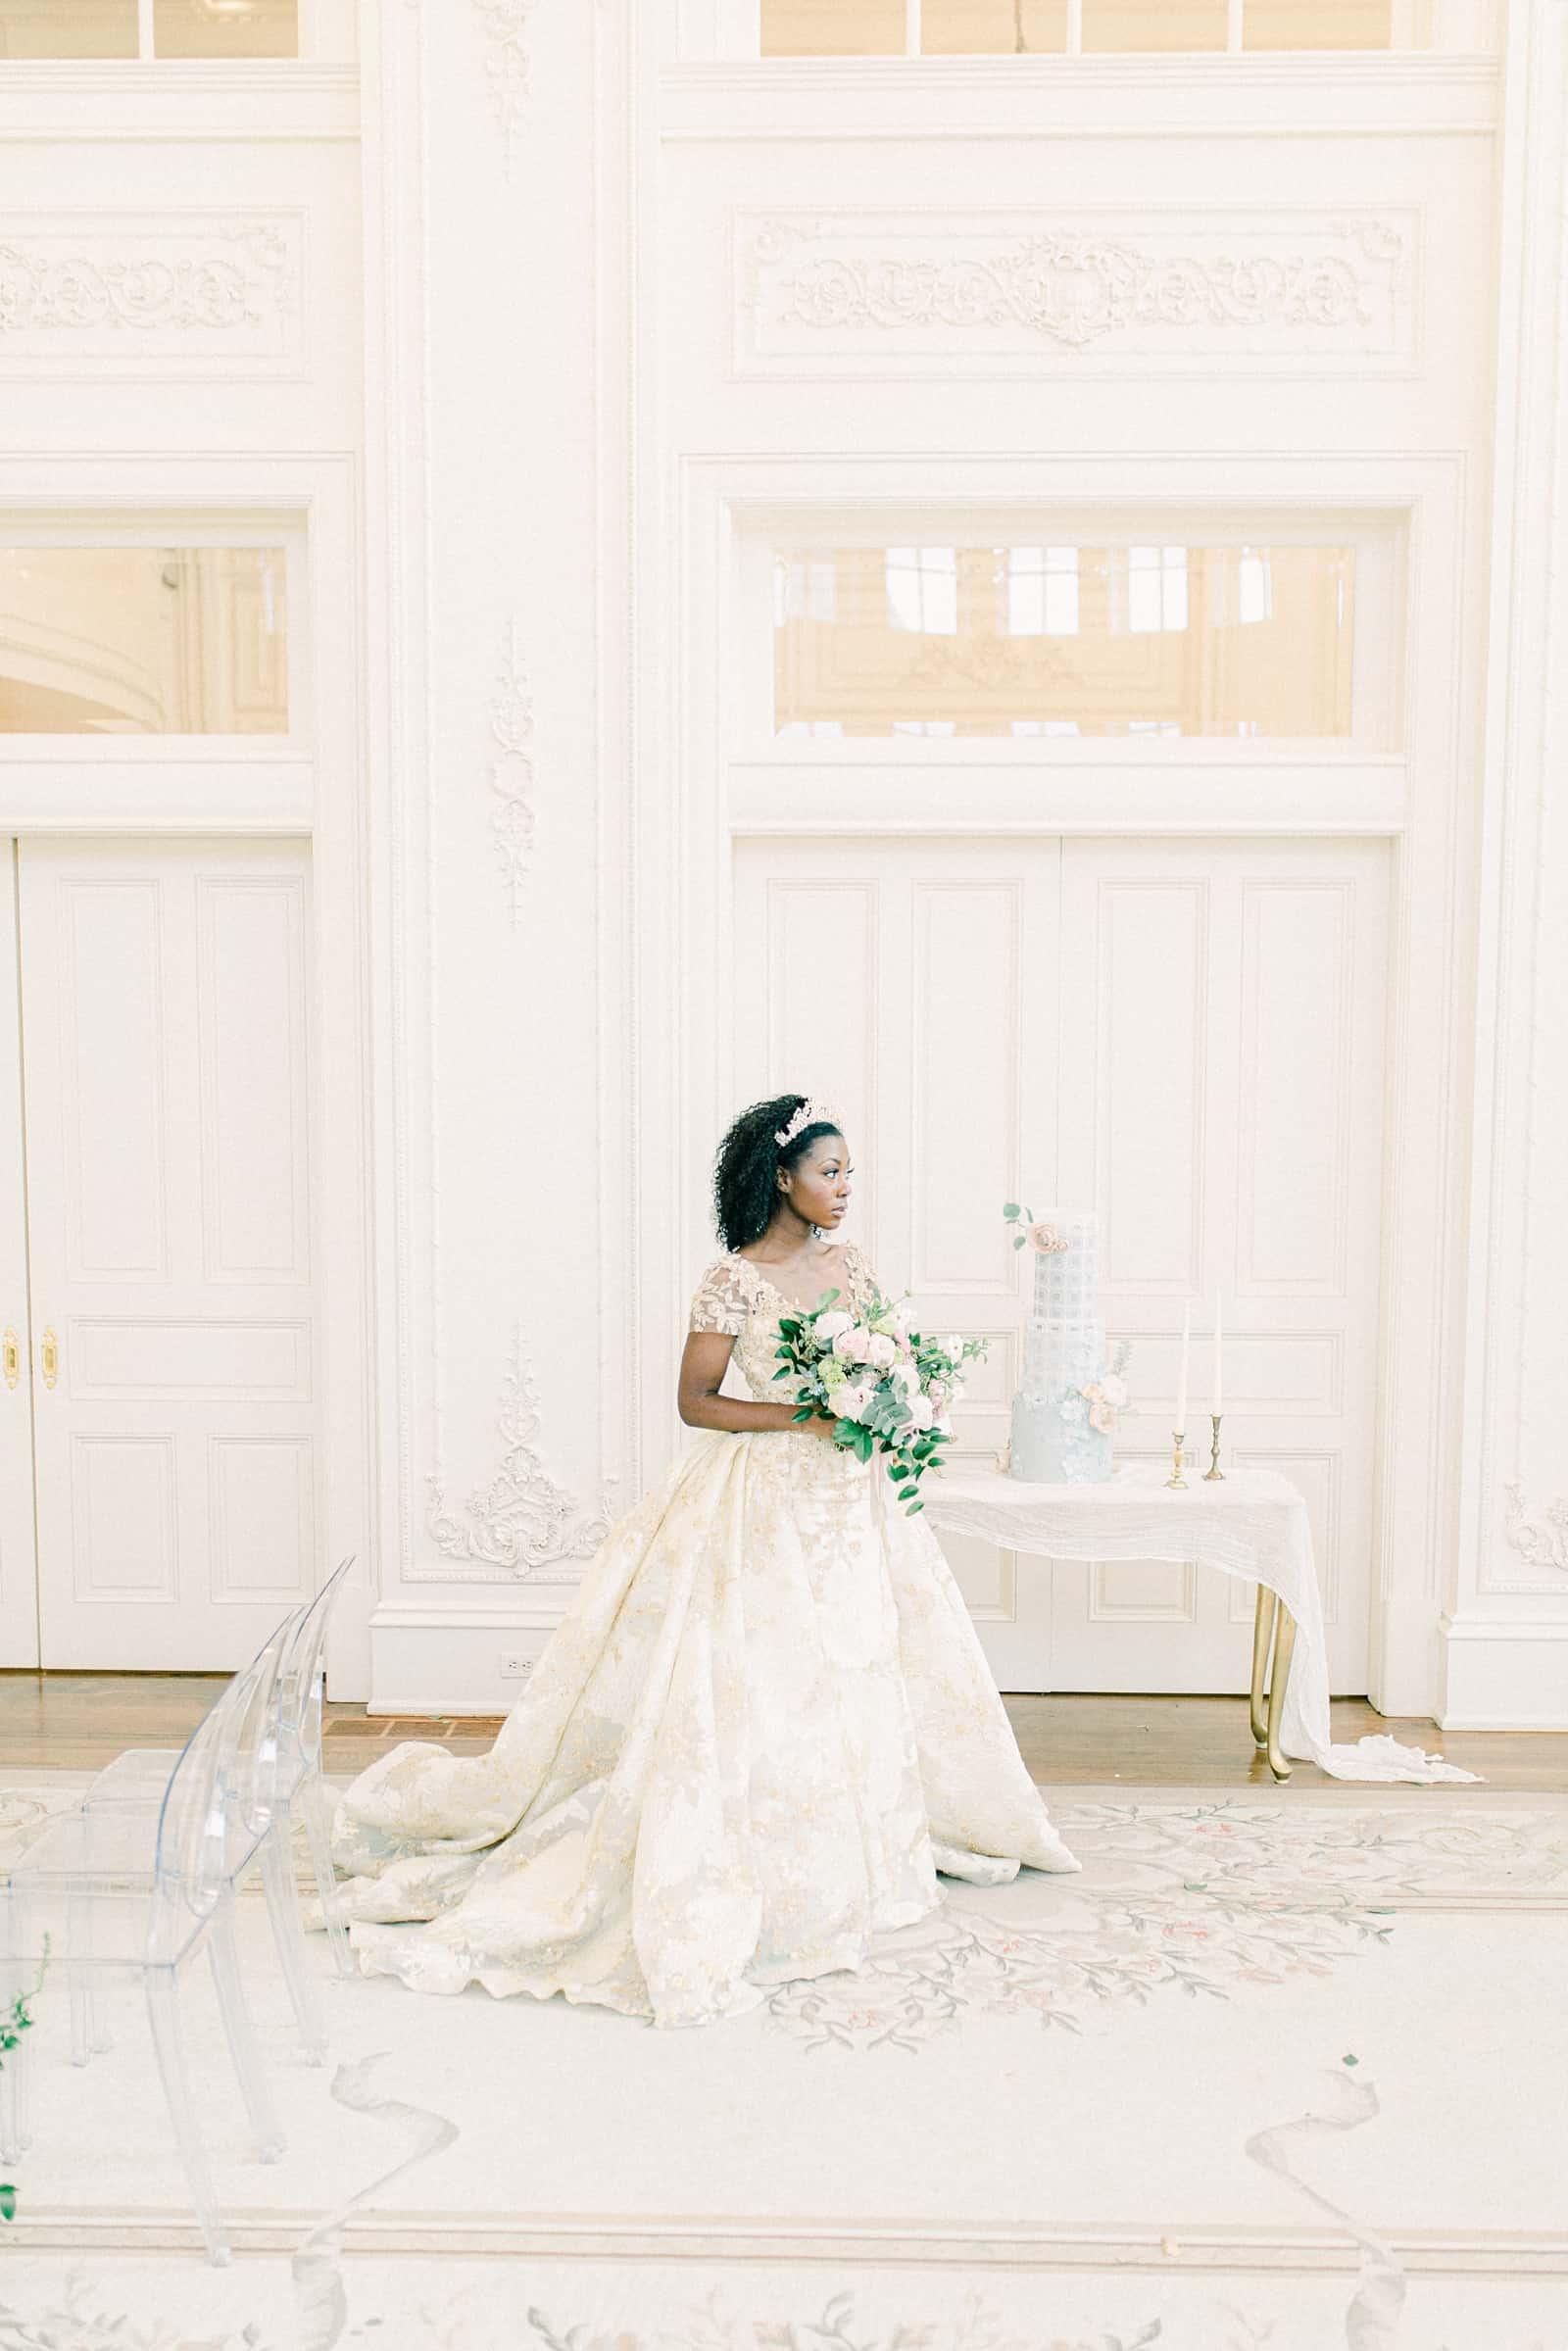 Disney princess bride with tiara in all white ballroom, elegant high end wedding